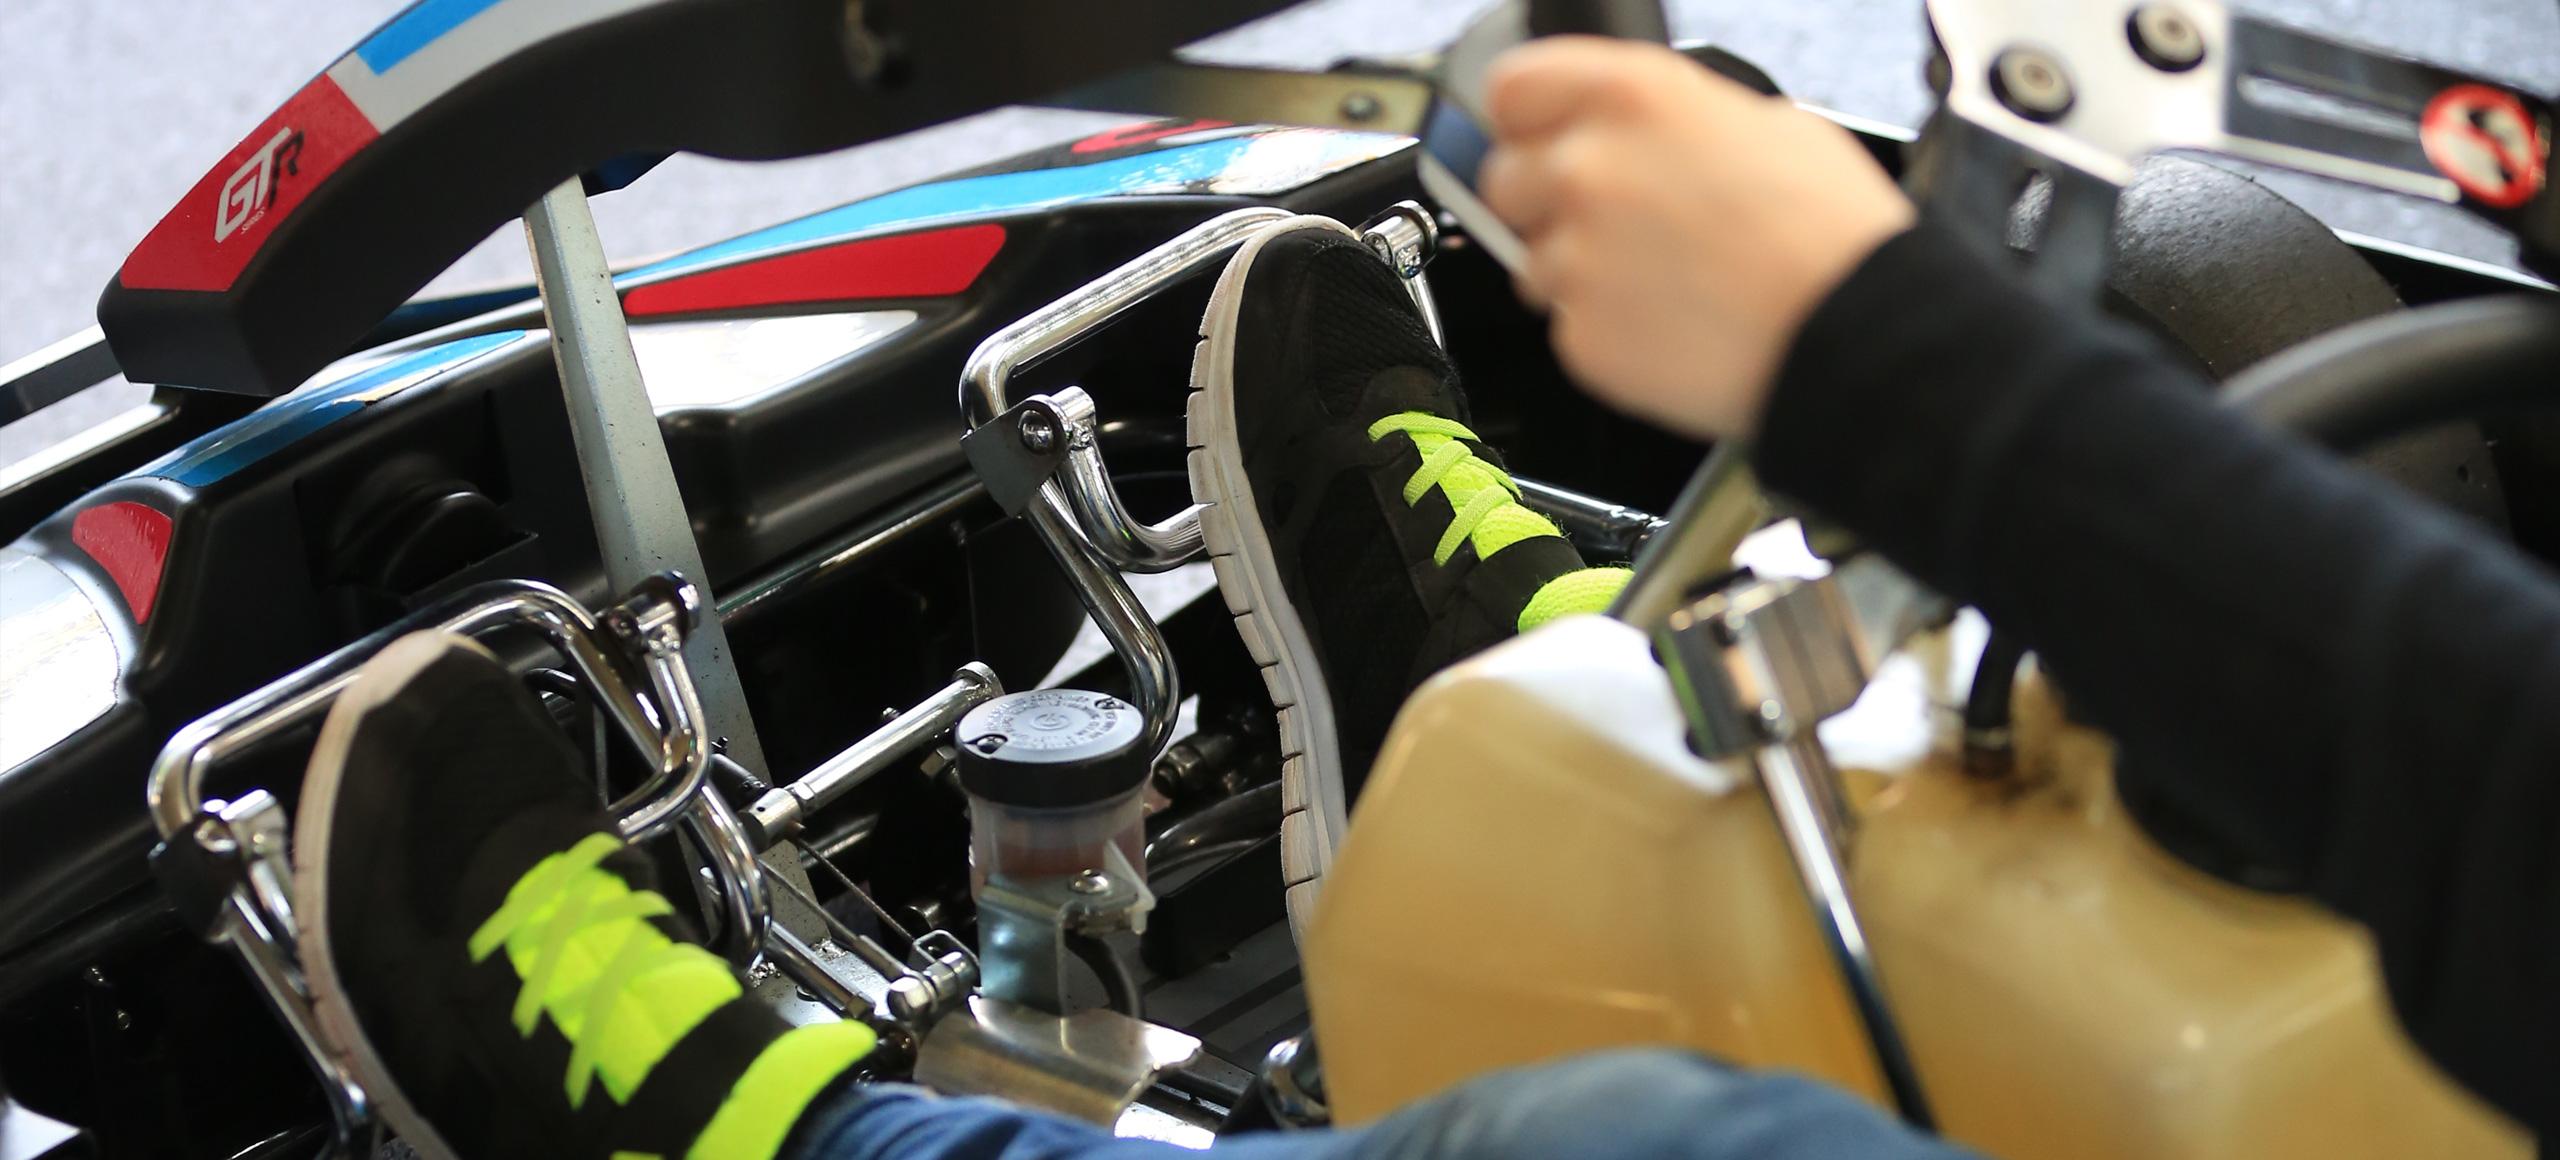 Kart Elementary School - Gokart by RS Speedworld  Premium